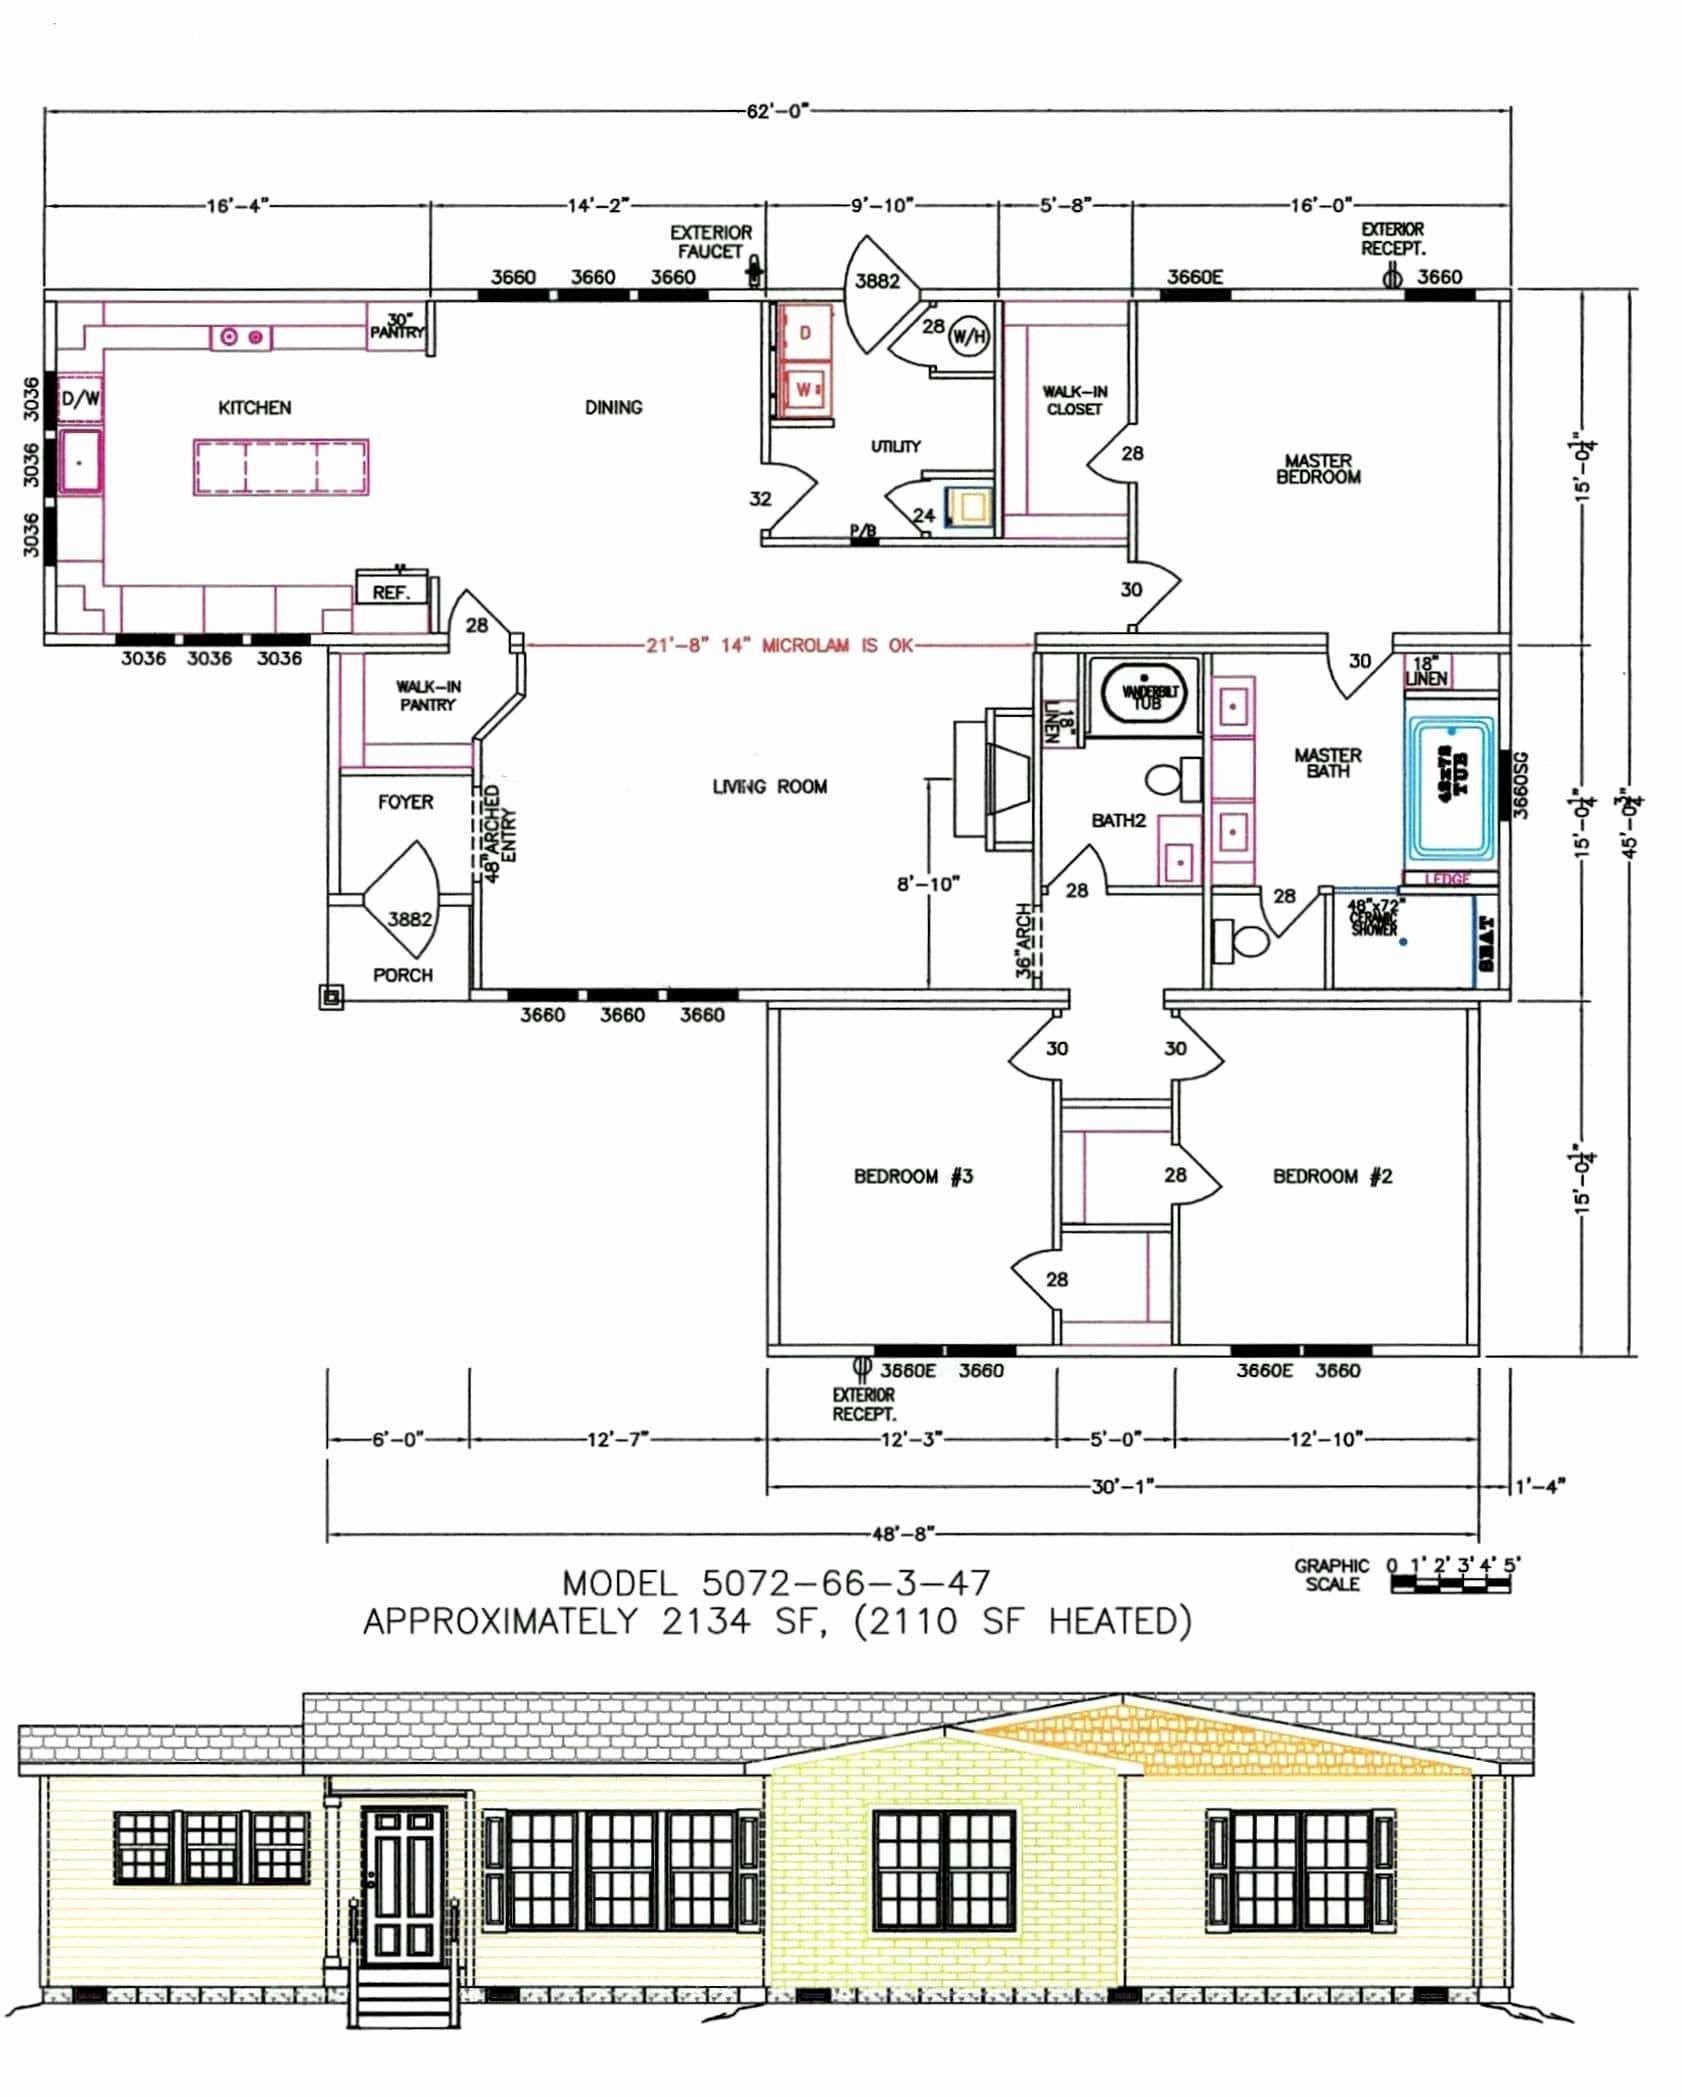 Quadruple Wide Mobile Homes Floor Plans In 2020 Mobile Home Floor Plans House Floor Plans Floor Plans